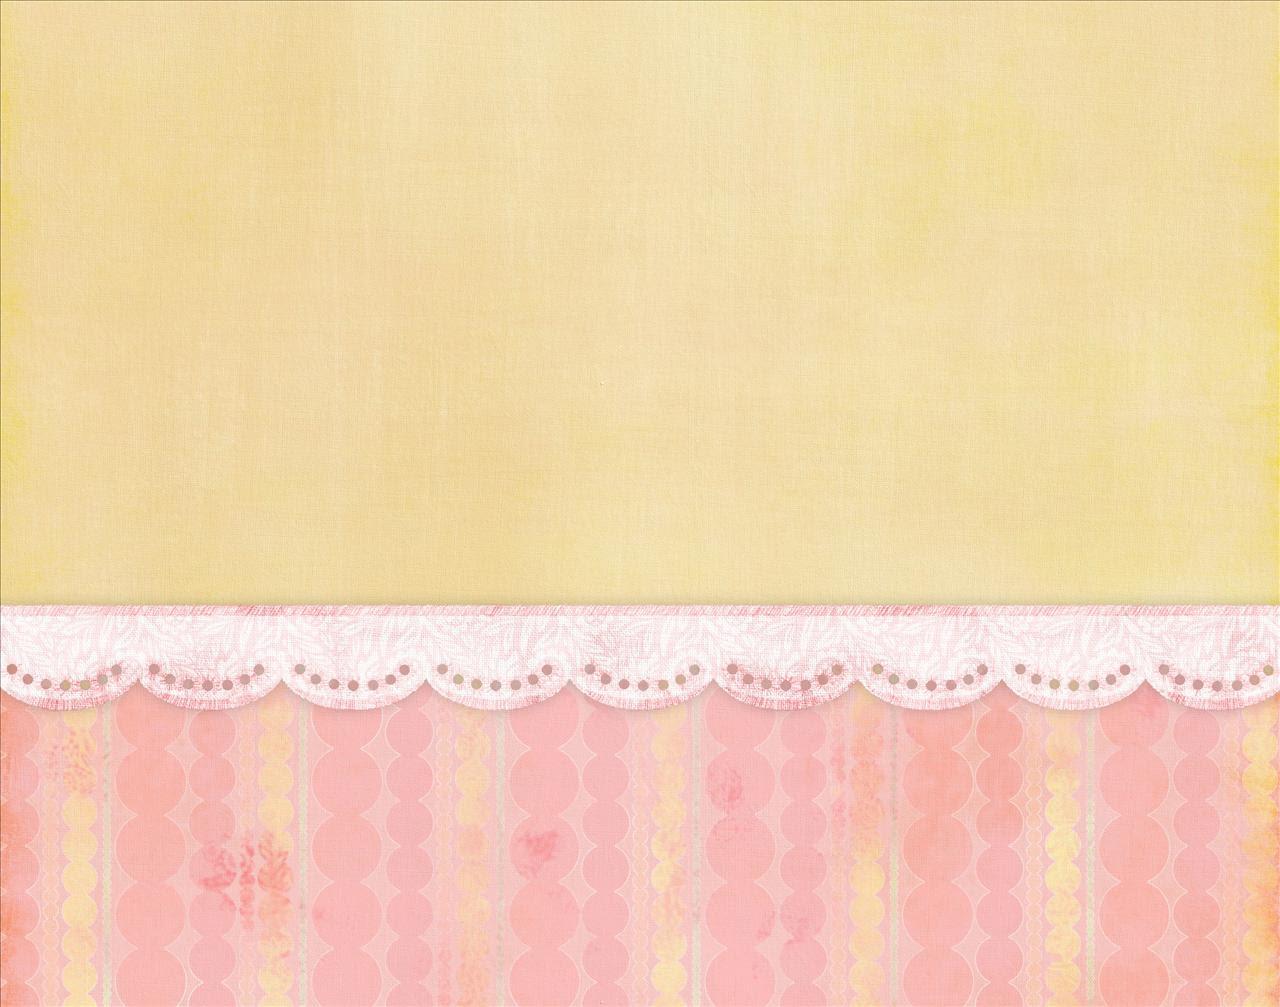 Background Warna Soft Pink Koleksi Gambar HD